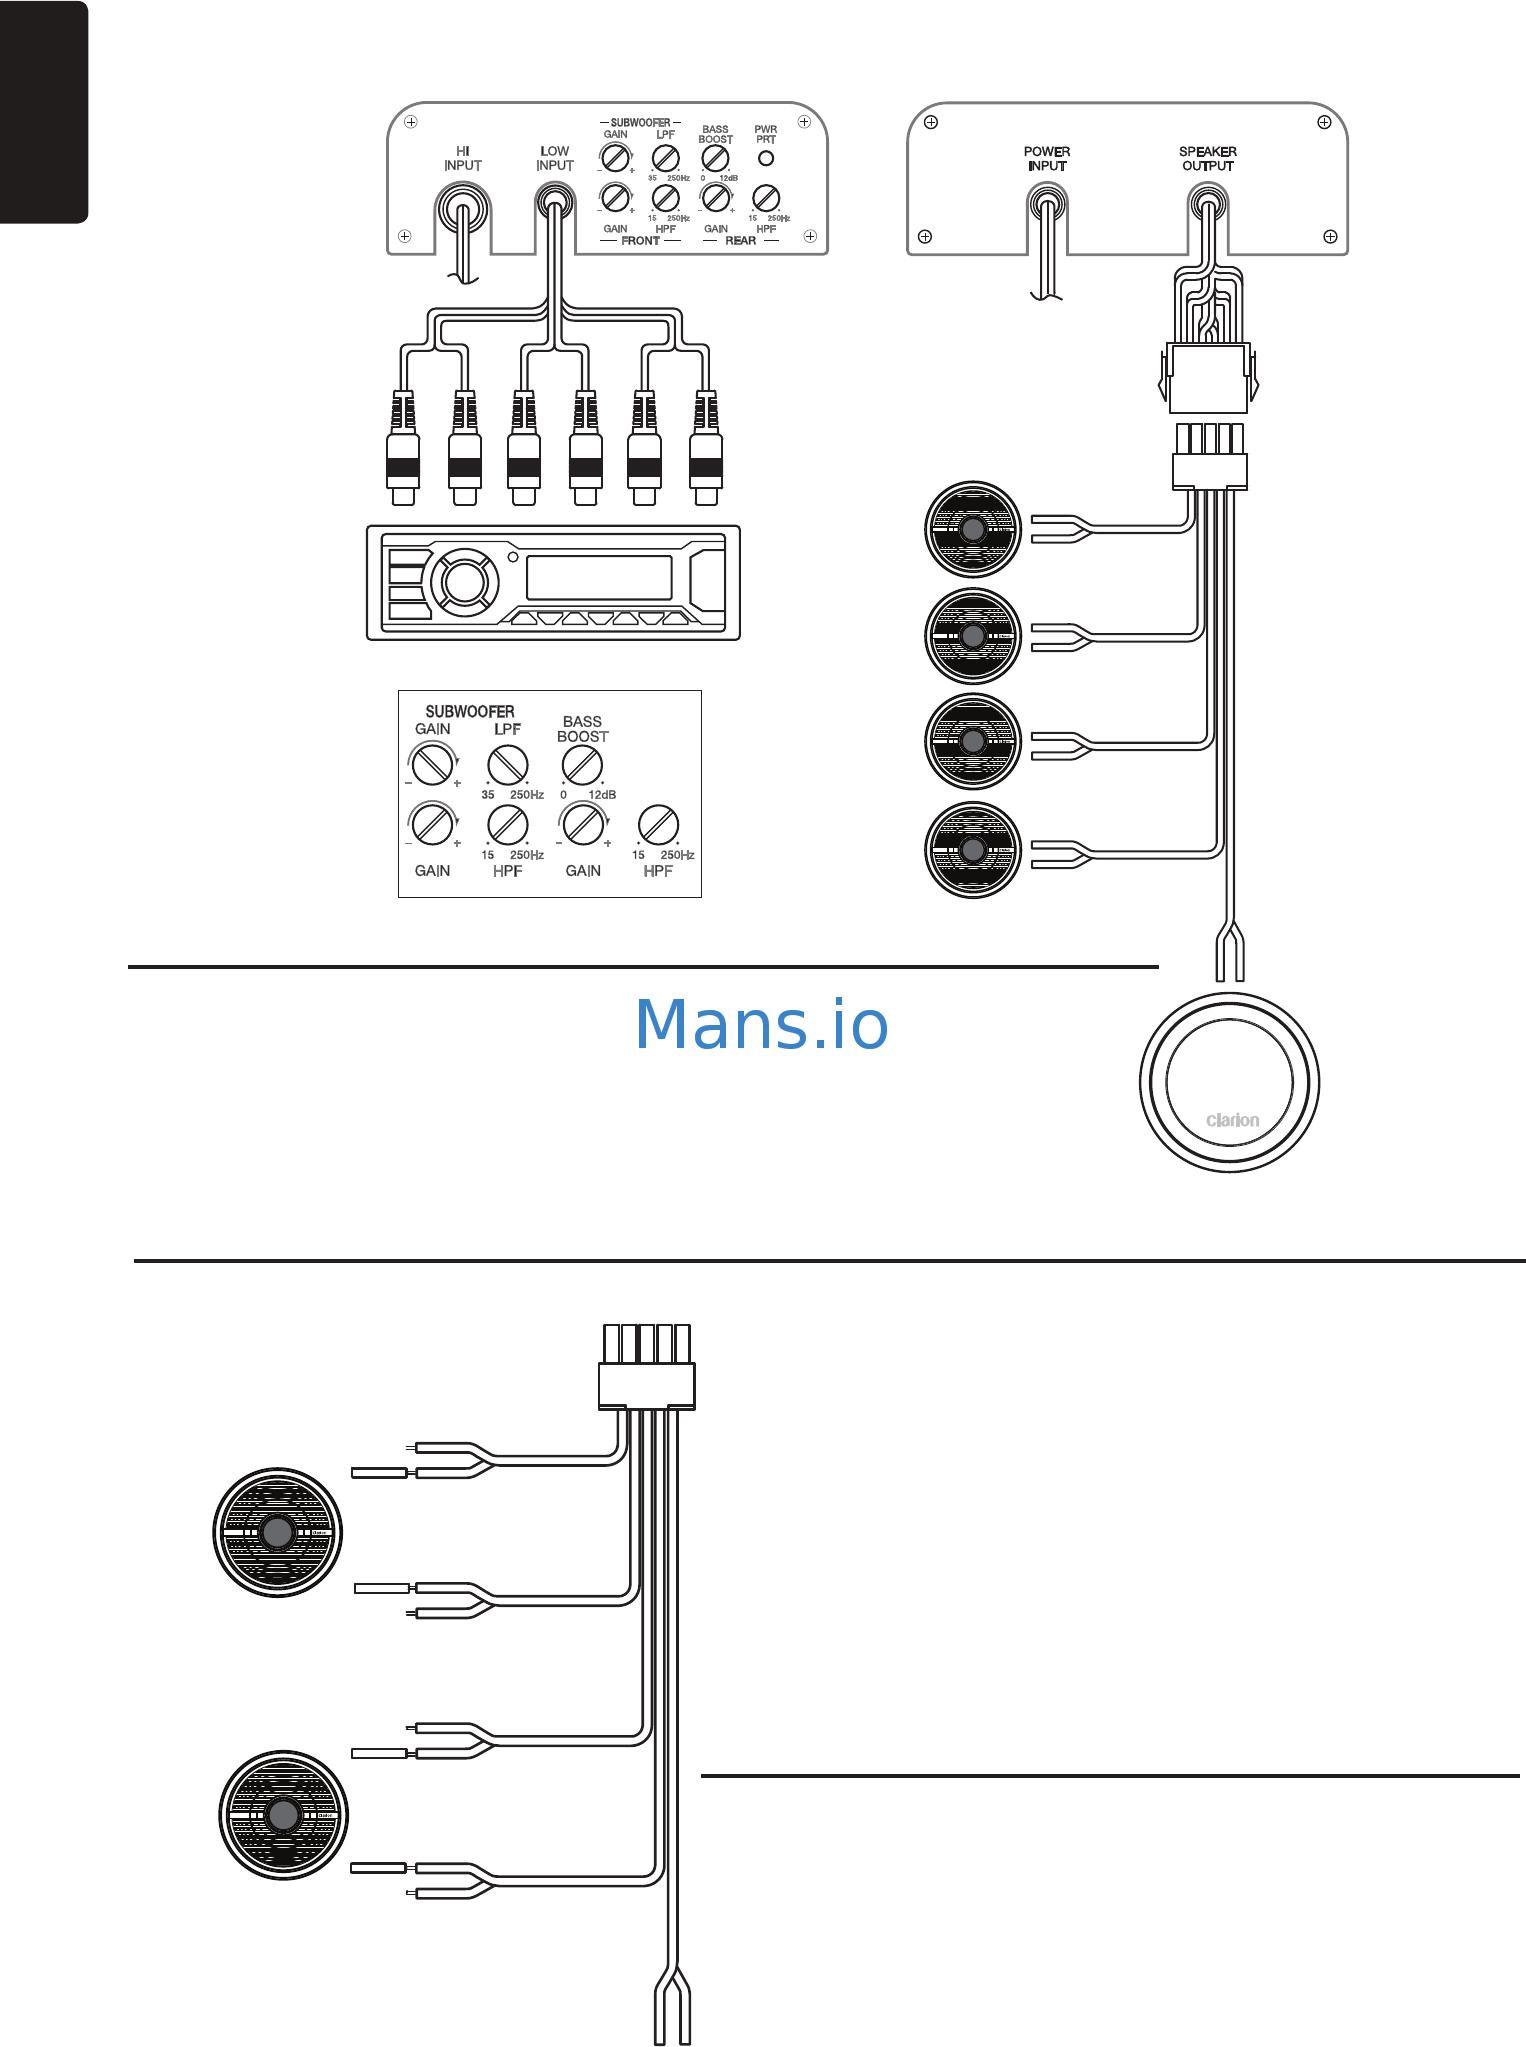 1999 volvo c70 s70 v70 wiring diagrams manuals